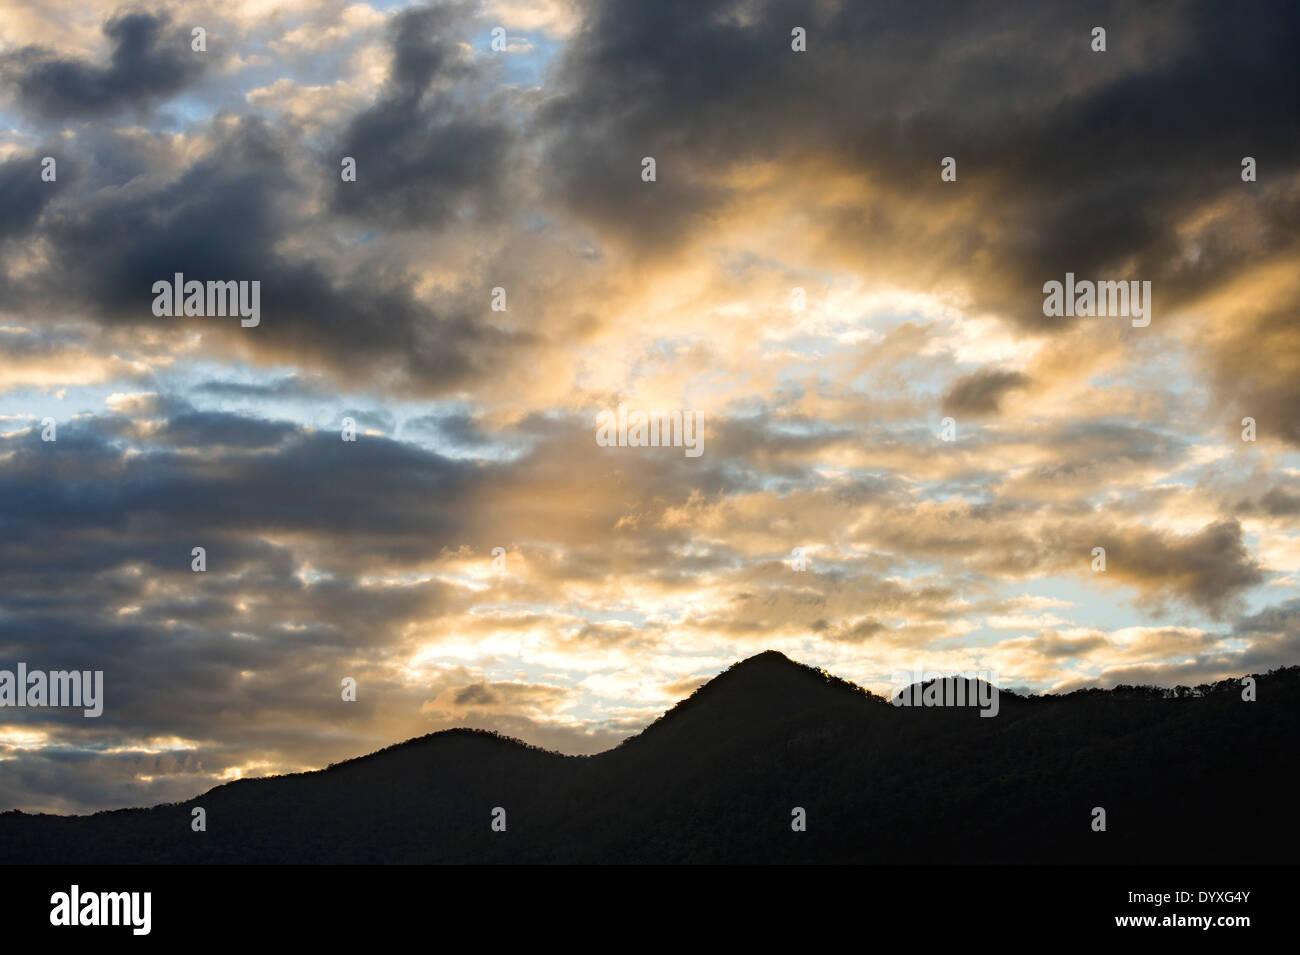 Silhoutted mountain range & sunset sky, QLD Australia Stock Photo